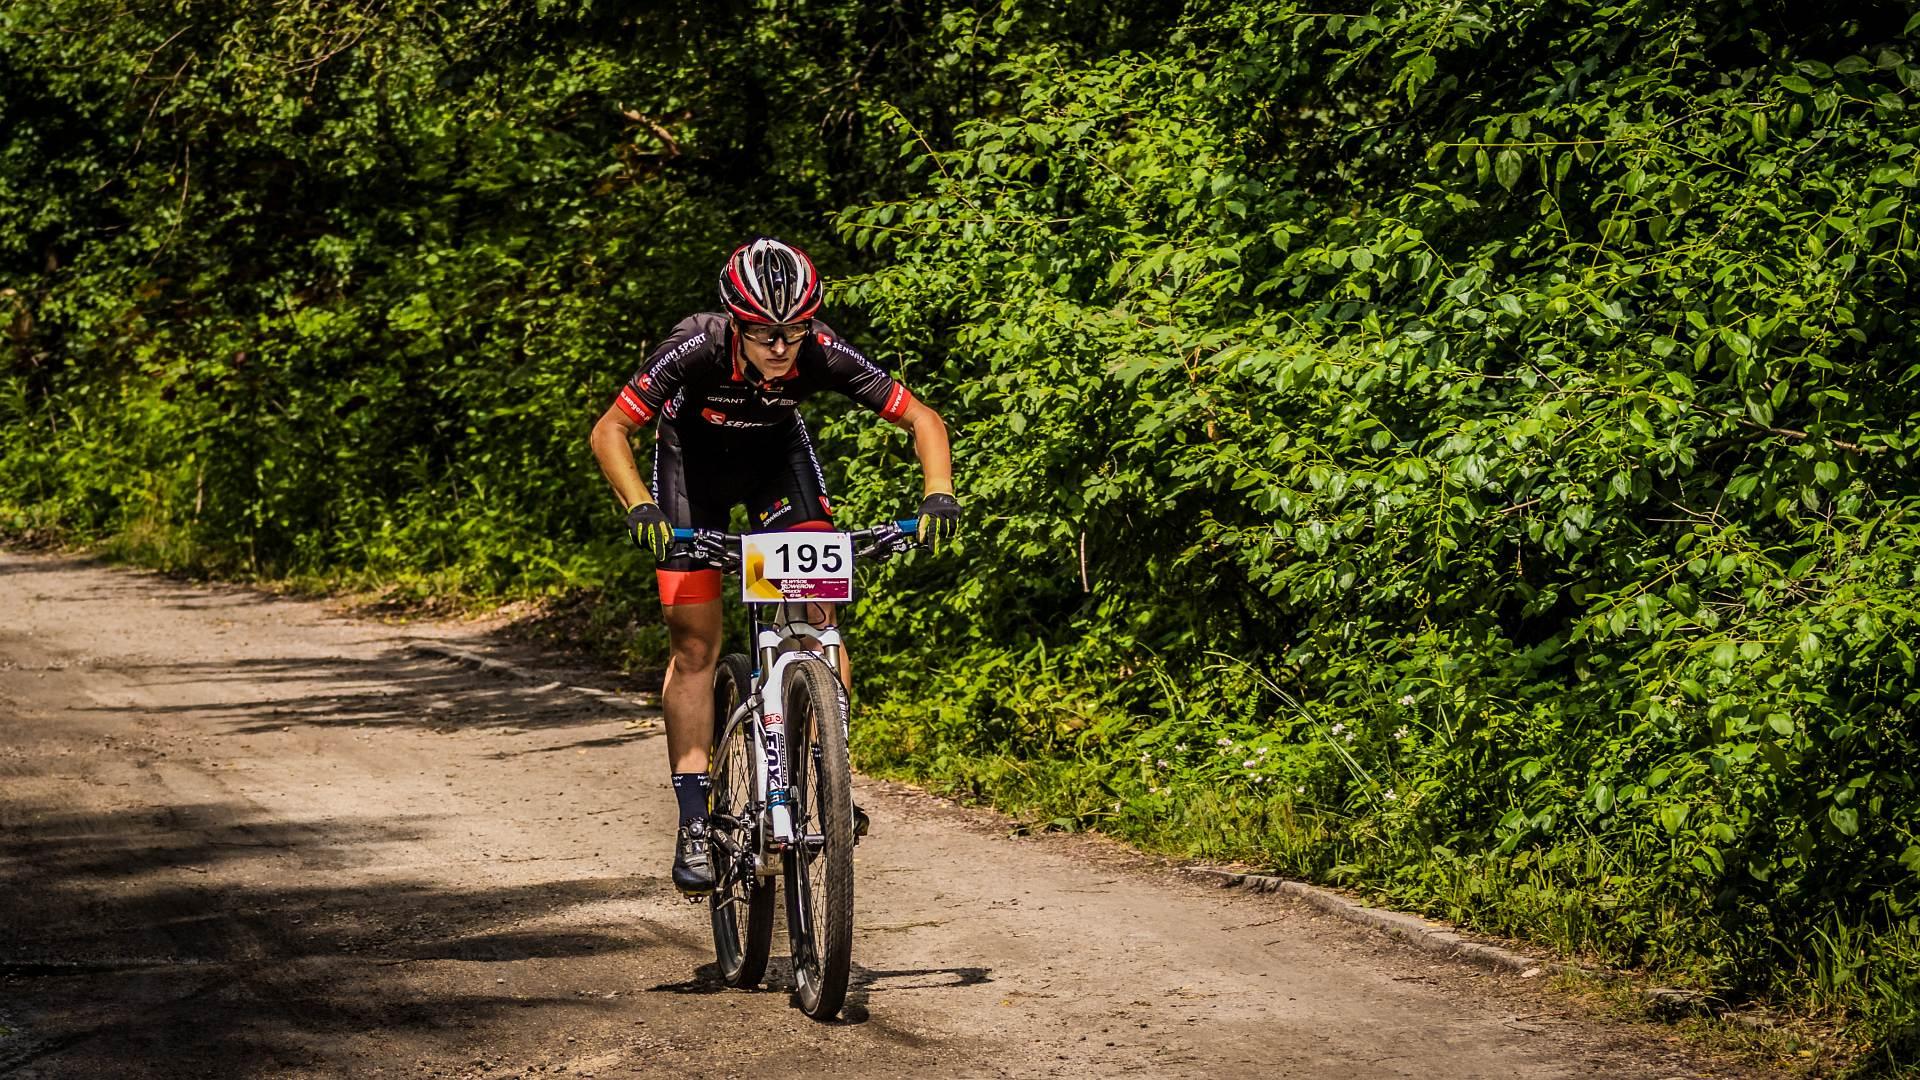 wyscig-rowerow-gorskich-0081